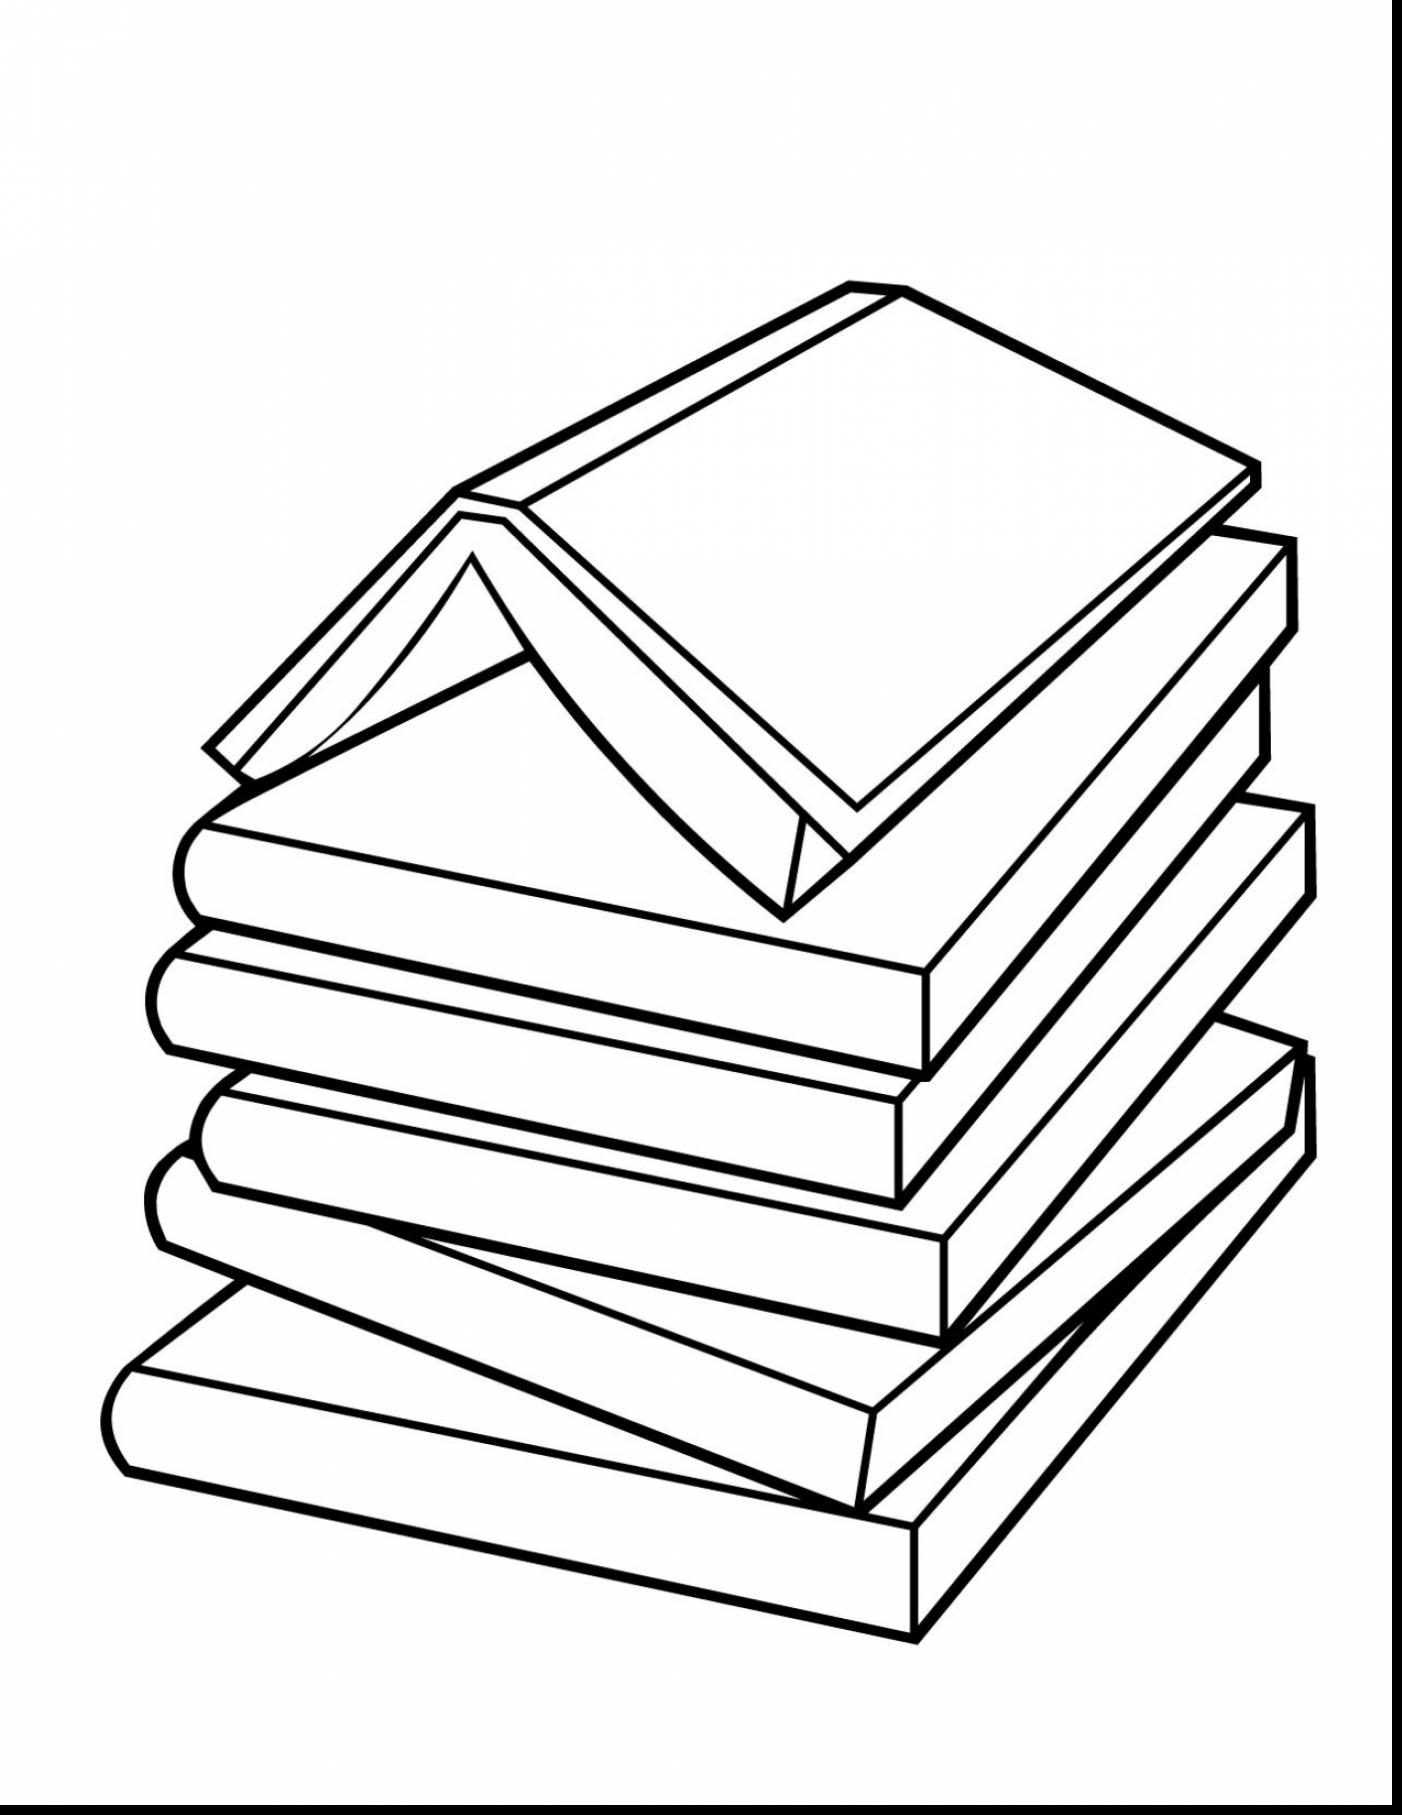 Book Stack Drawing At Getdrawings